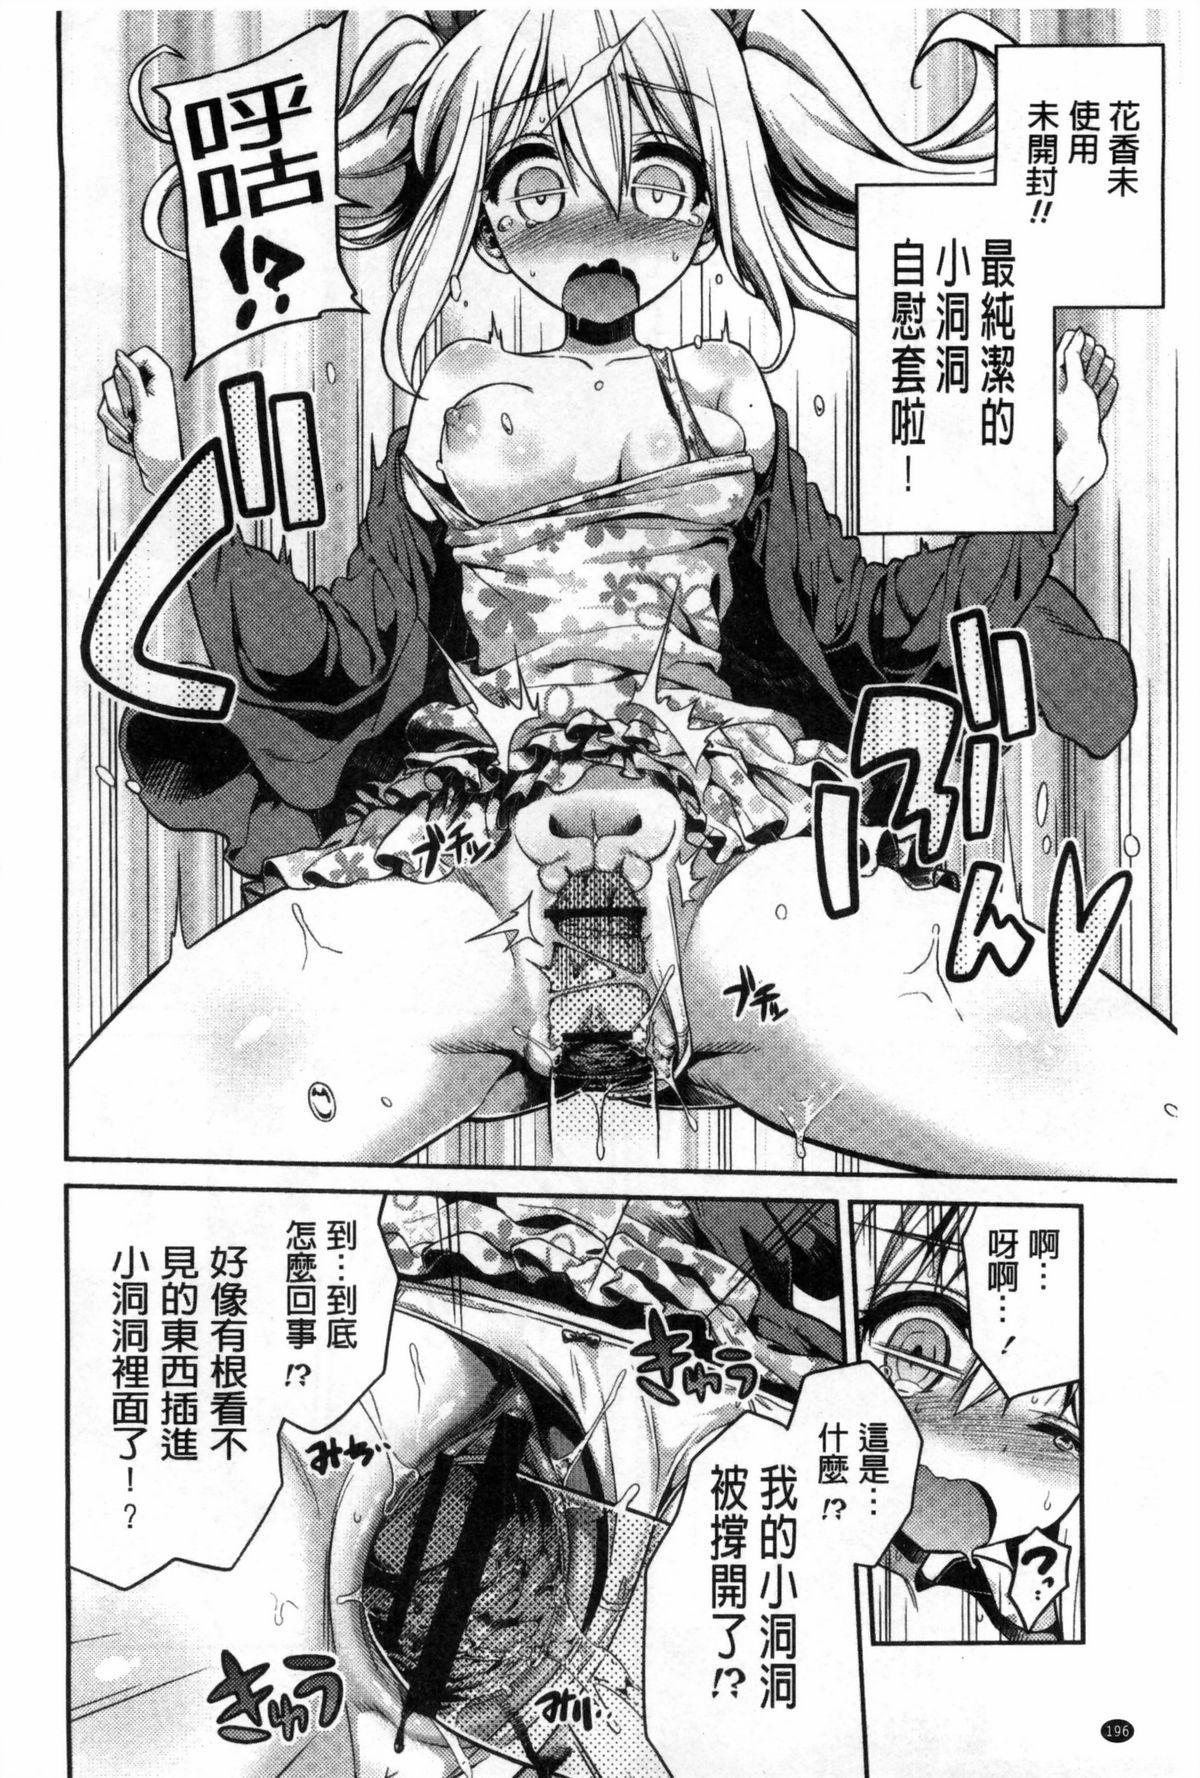 Man x Koi - Ero Manga de Hajimaru Koi no Plot   A漫×戀情 由情色漫畫所萌生的戀之物語 196